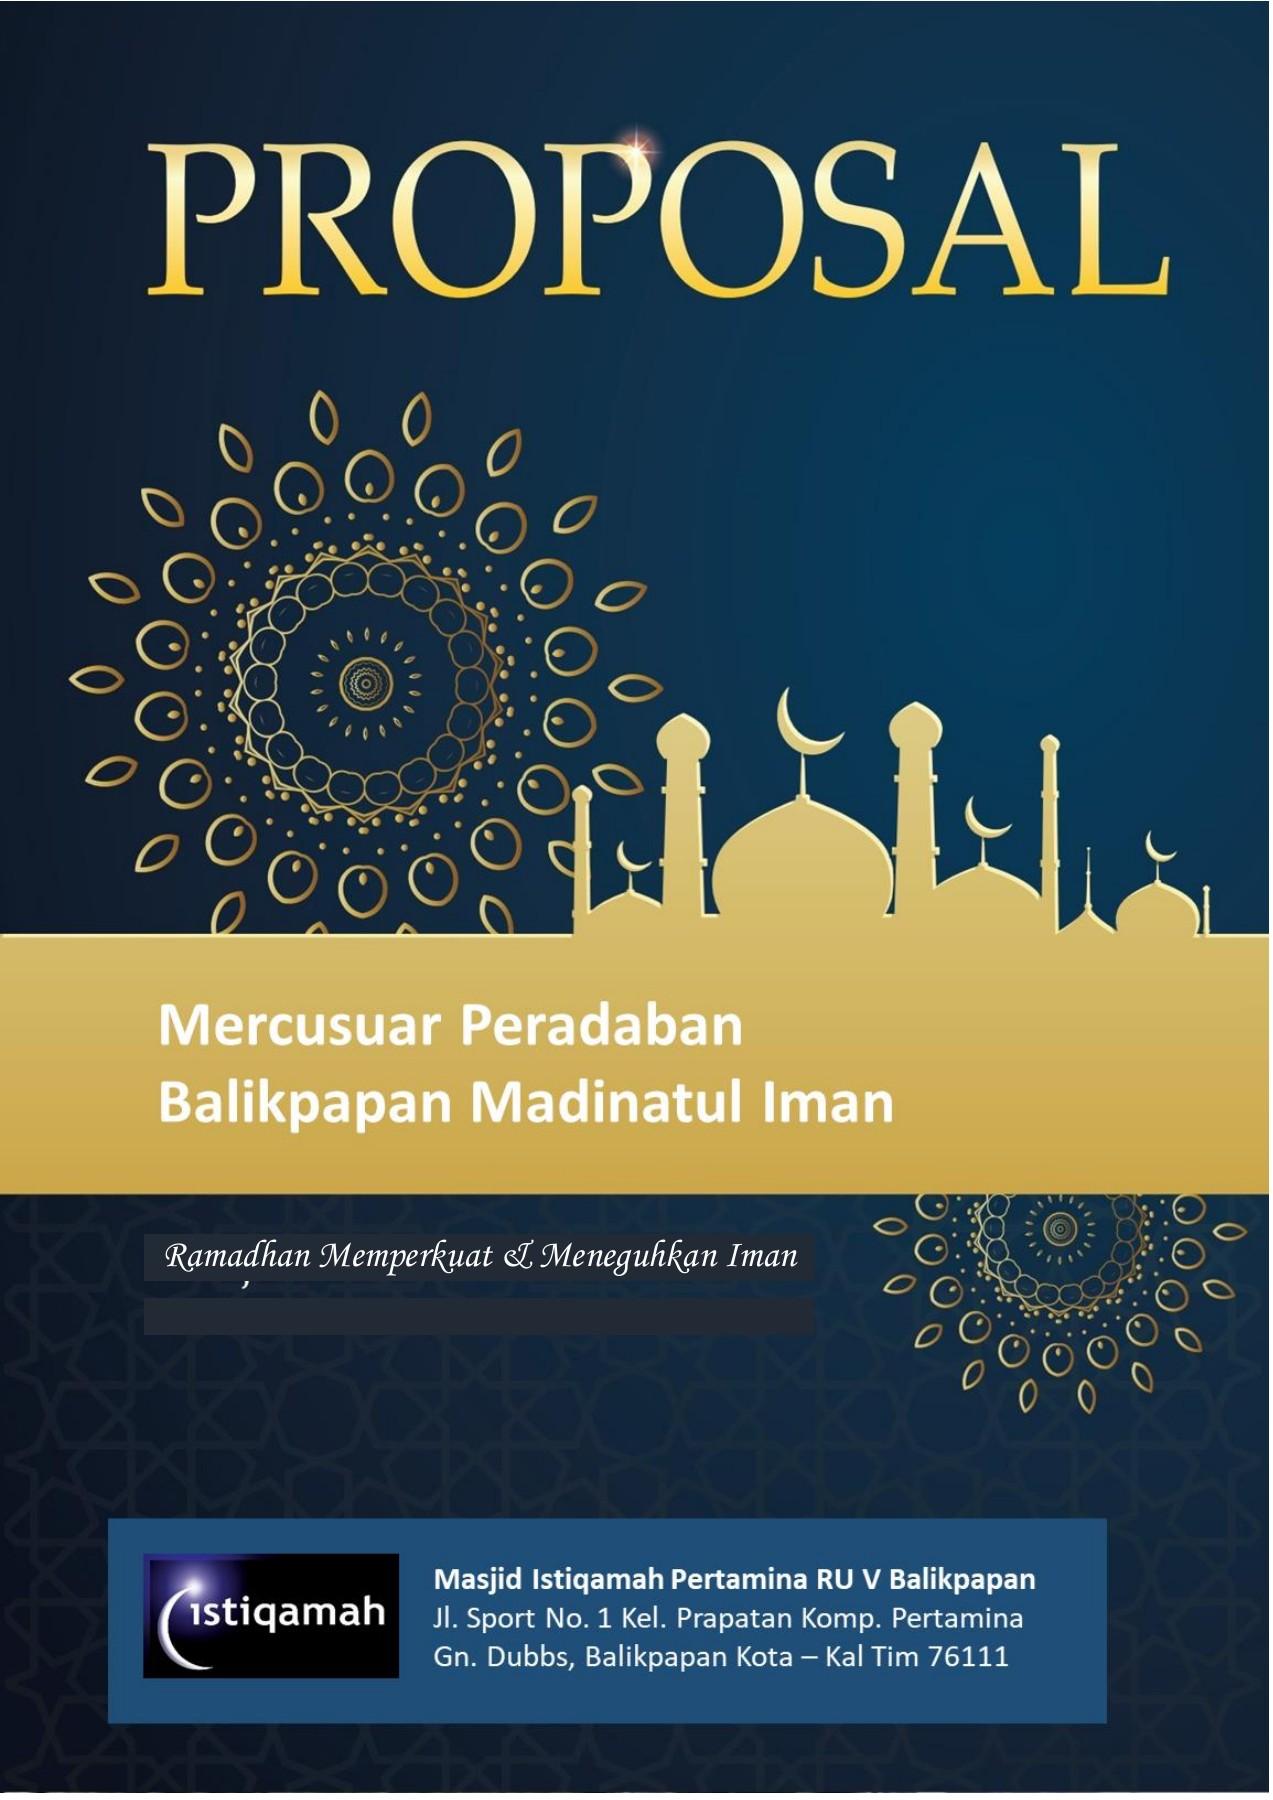 Cover Proposal Masjid : cover, proposal, masjid, PROPOSAL, RAMADHAN